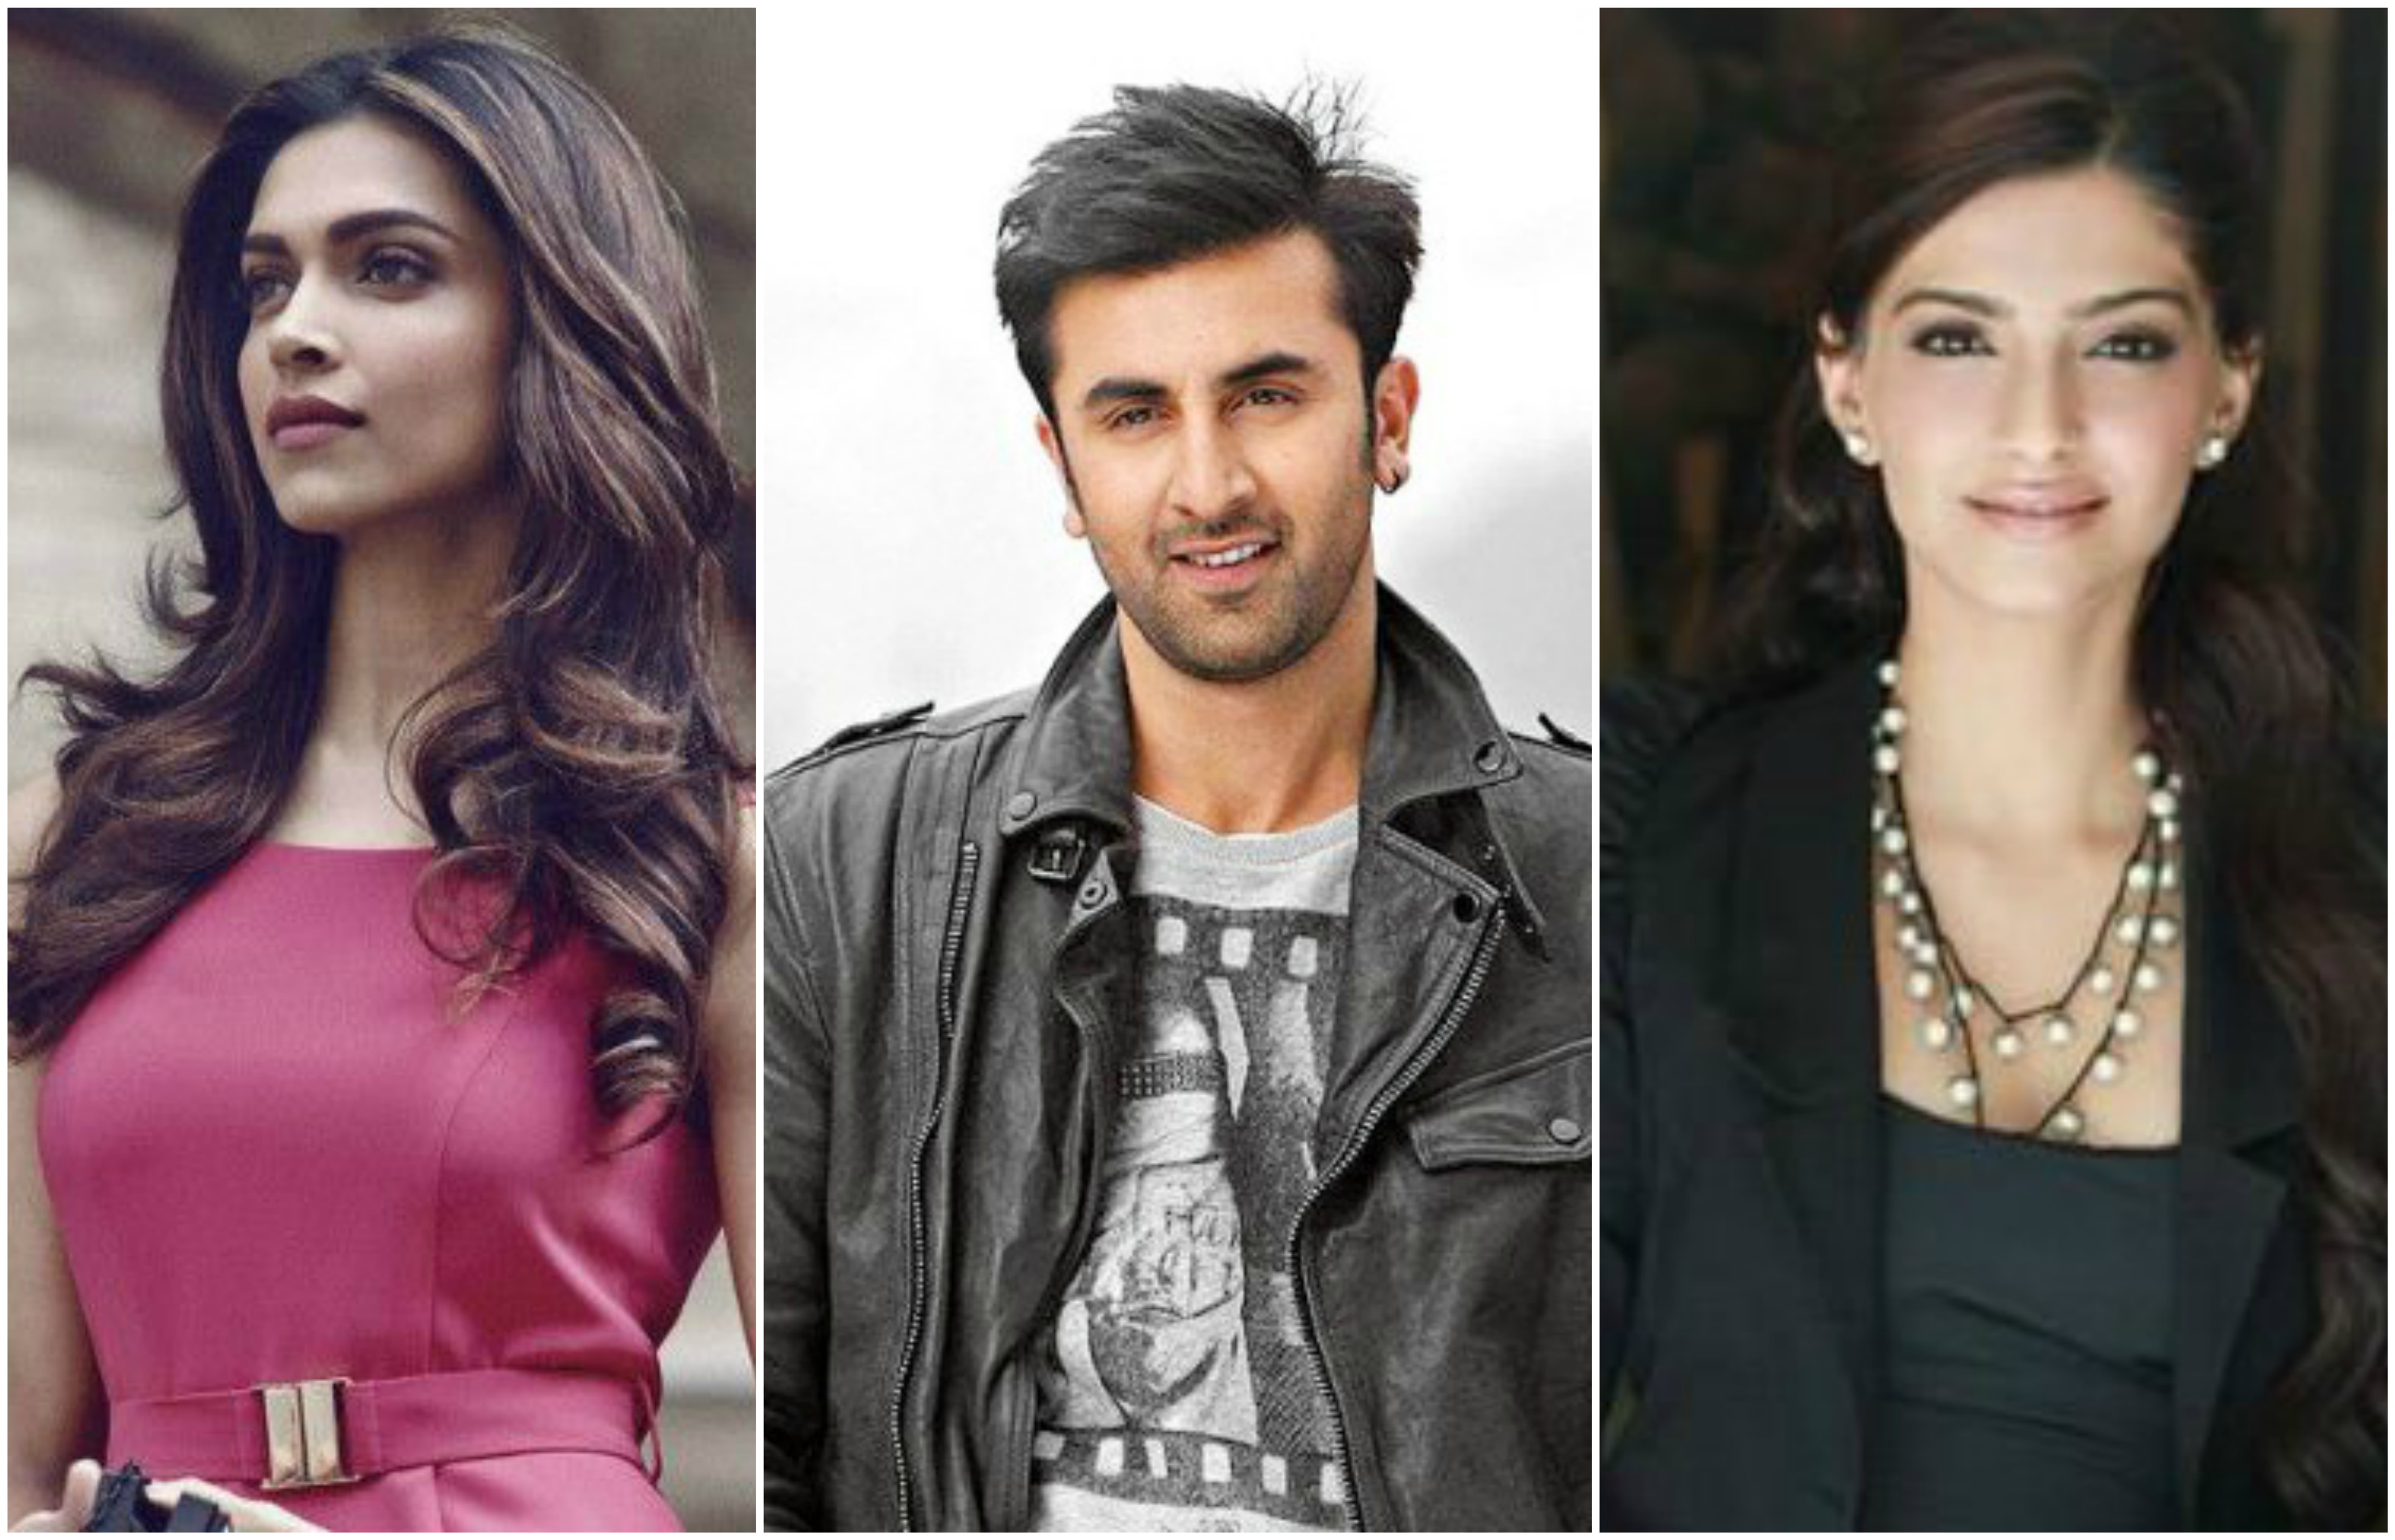 10 Years of Deepika Padukone, Ranbir Kapoor and Sonam Kapoor In The Industry